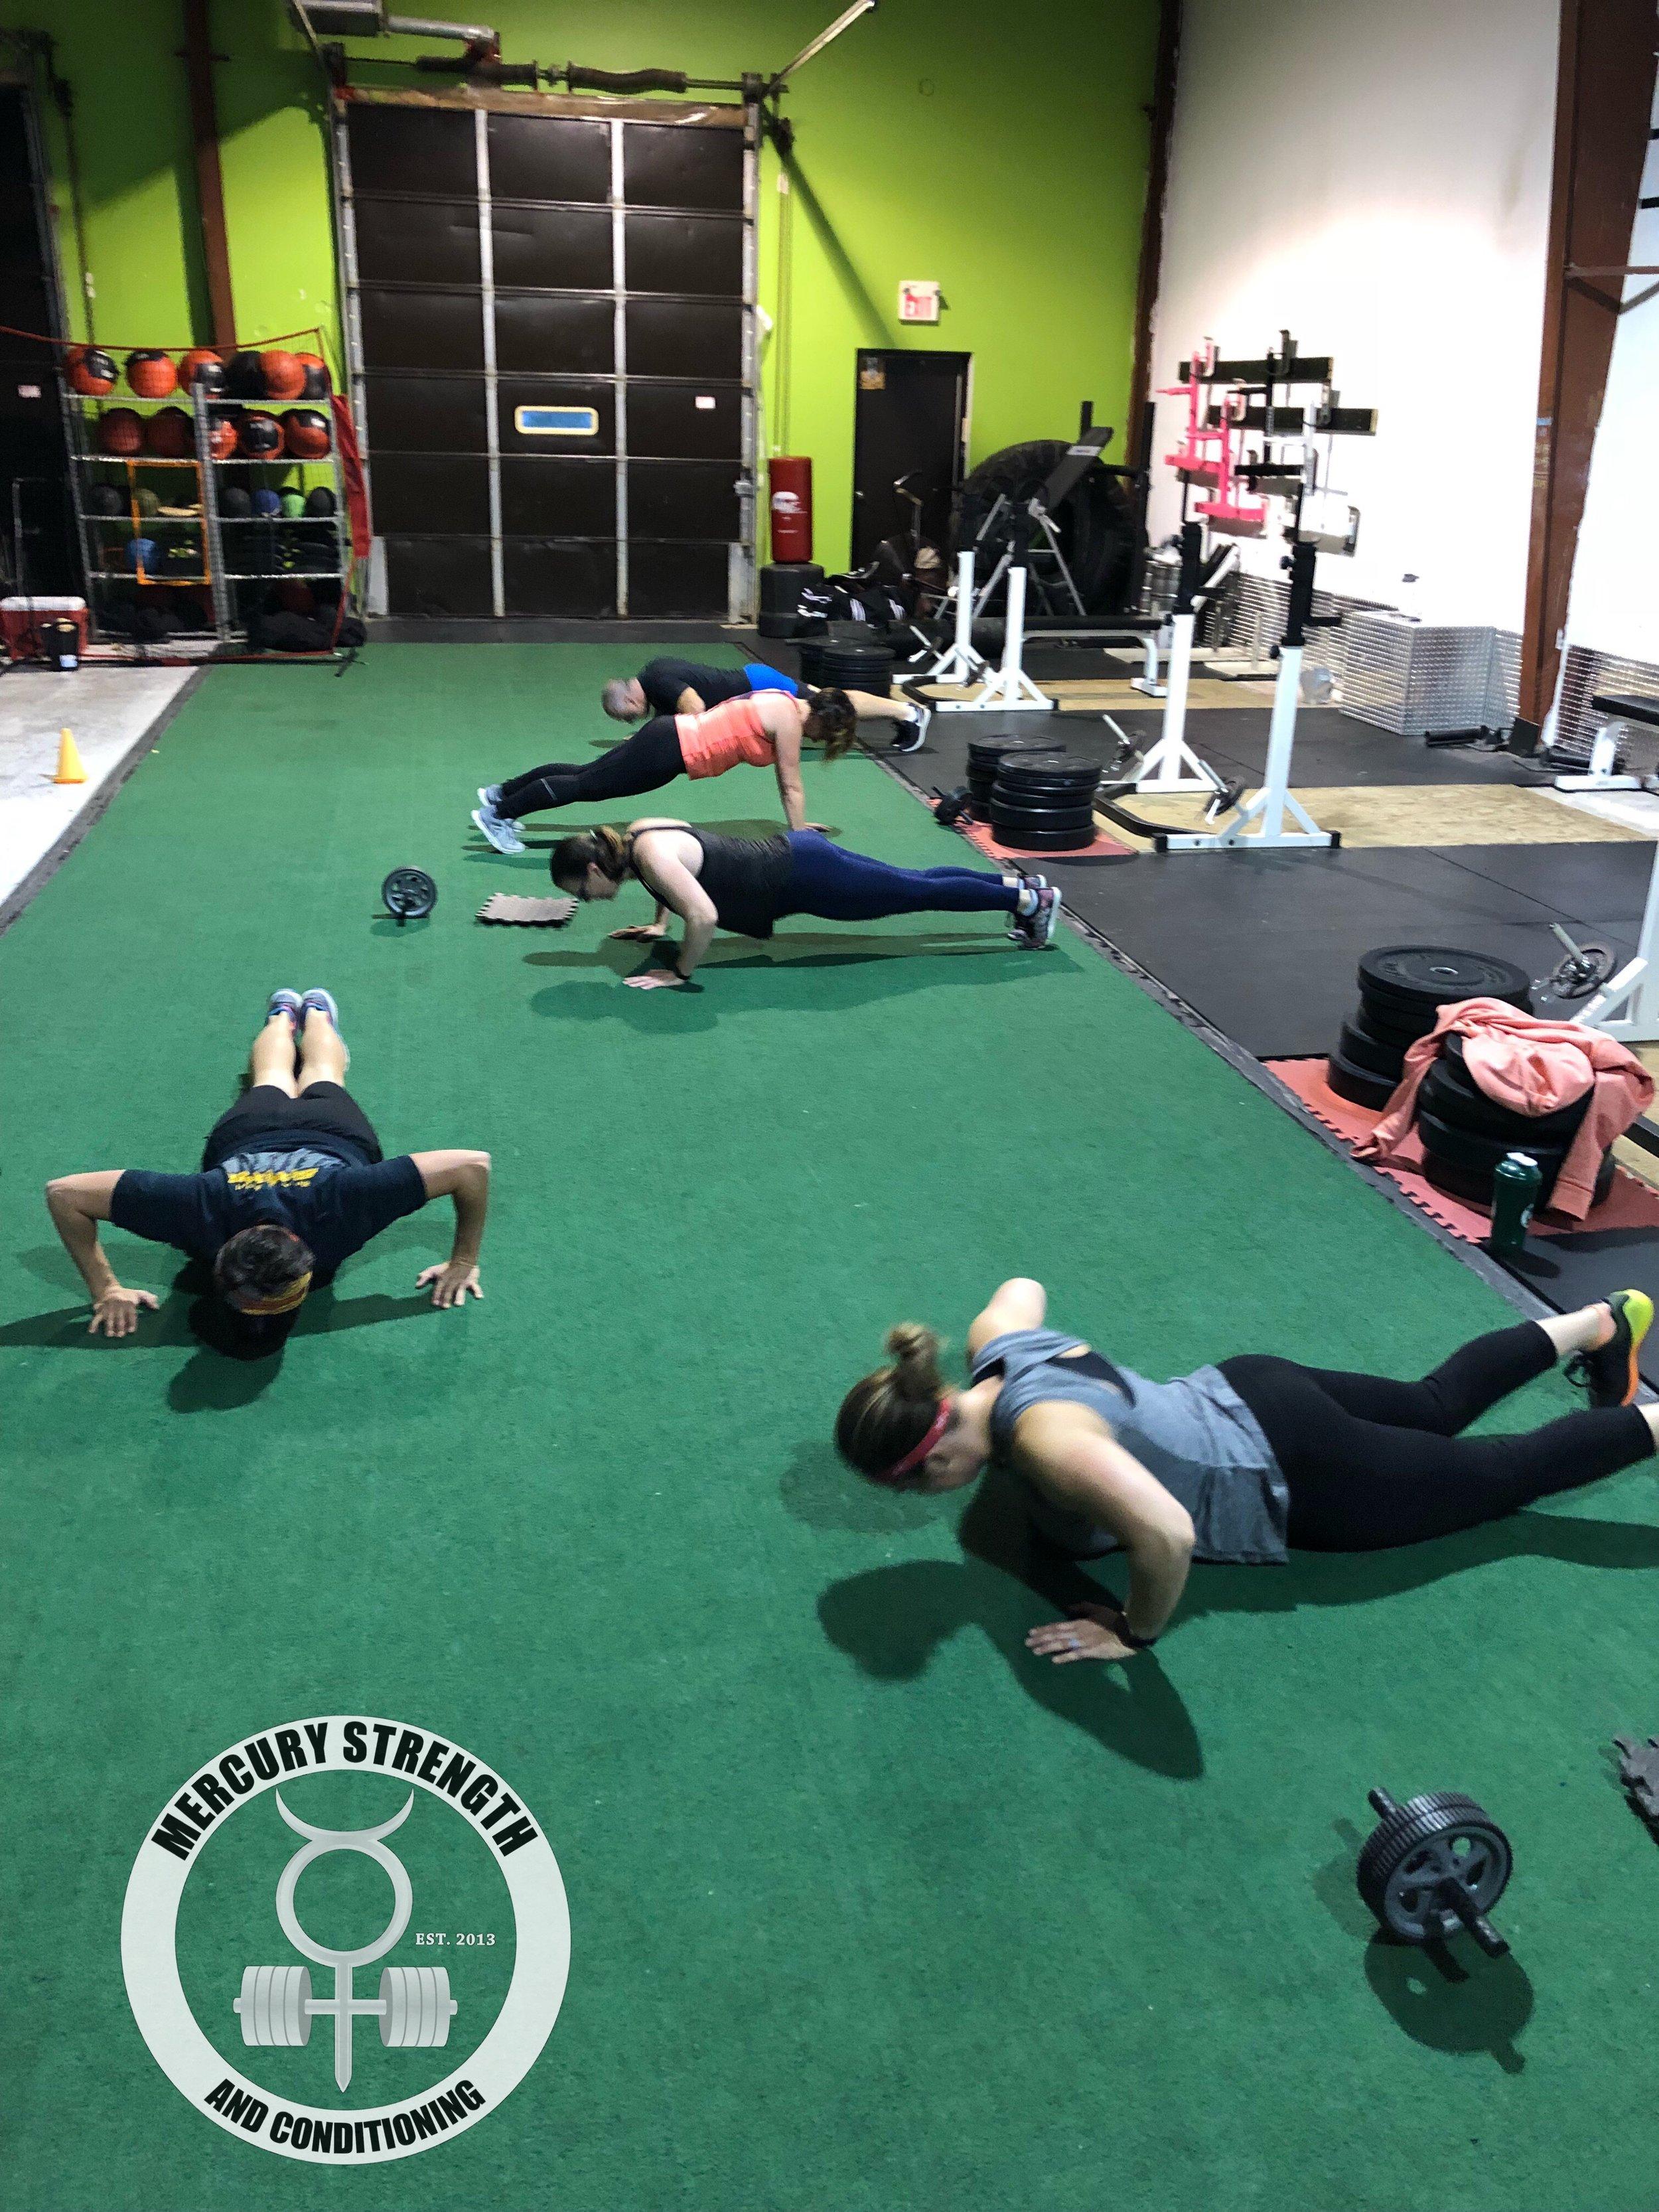 Gym-powerlifting-Olympic lifting-fitness-personal training-training-bootcamp-crossfit-kingston-kingston gym-kids-mercury-strength-conditioning-athlete-push ups